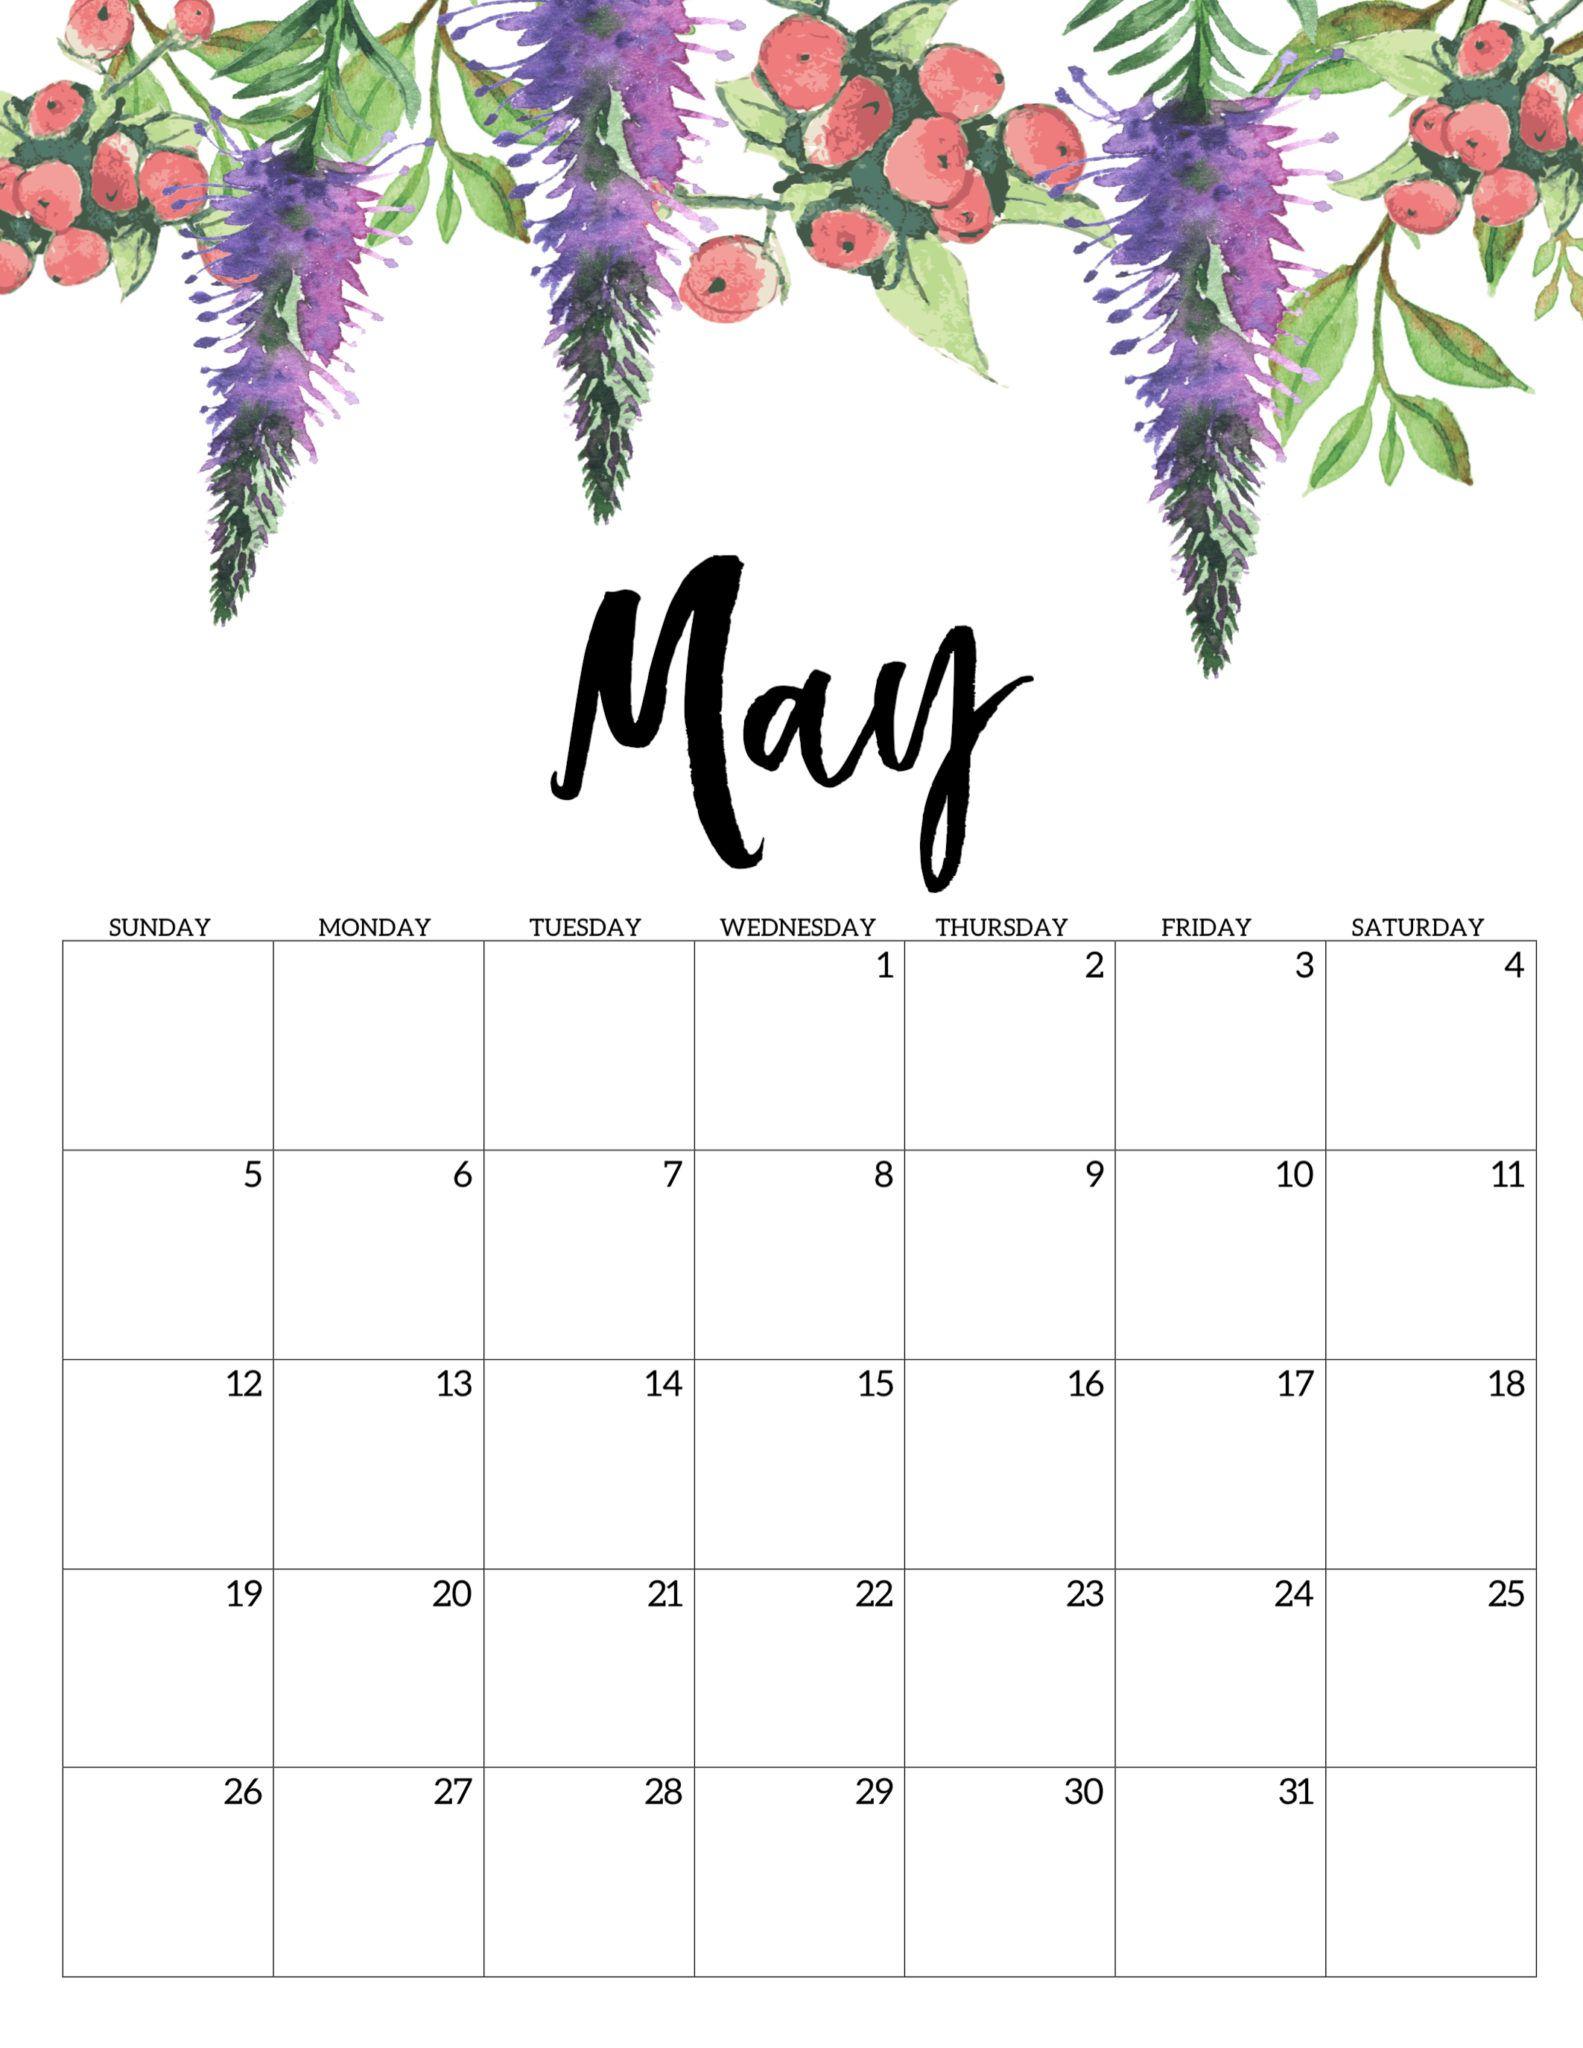 May 2019 Floral Calendar